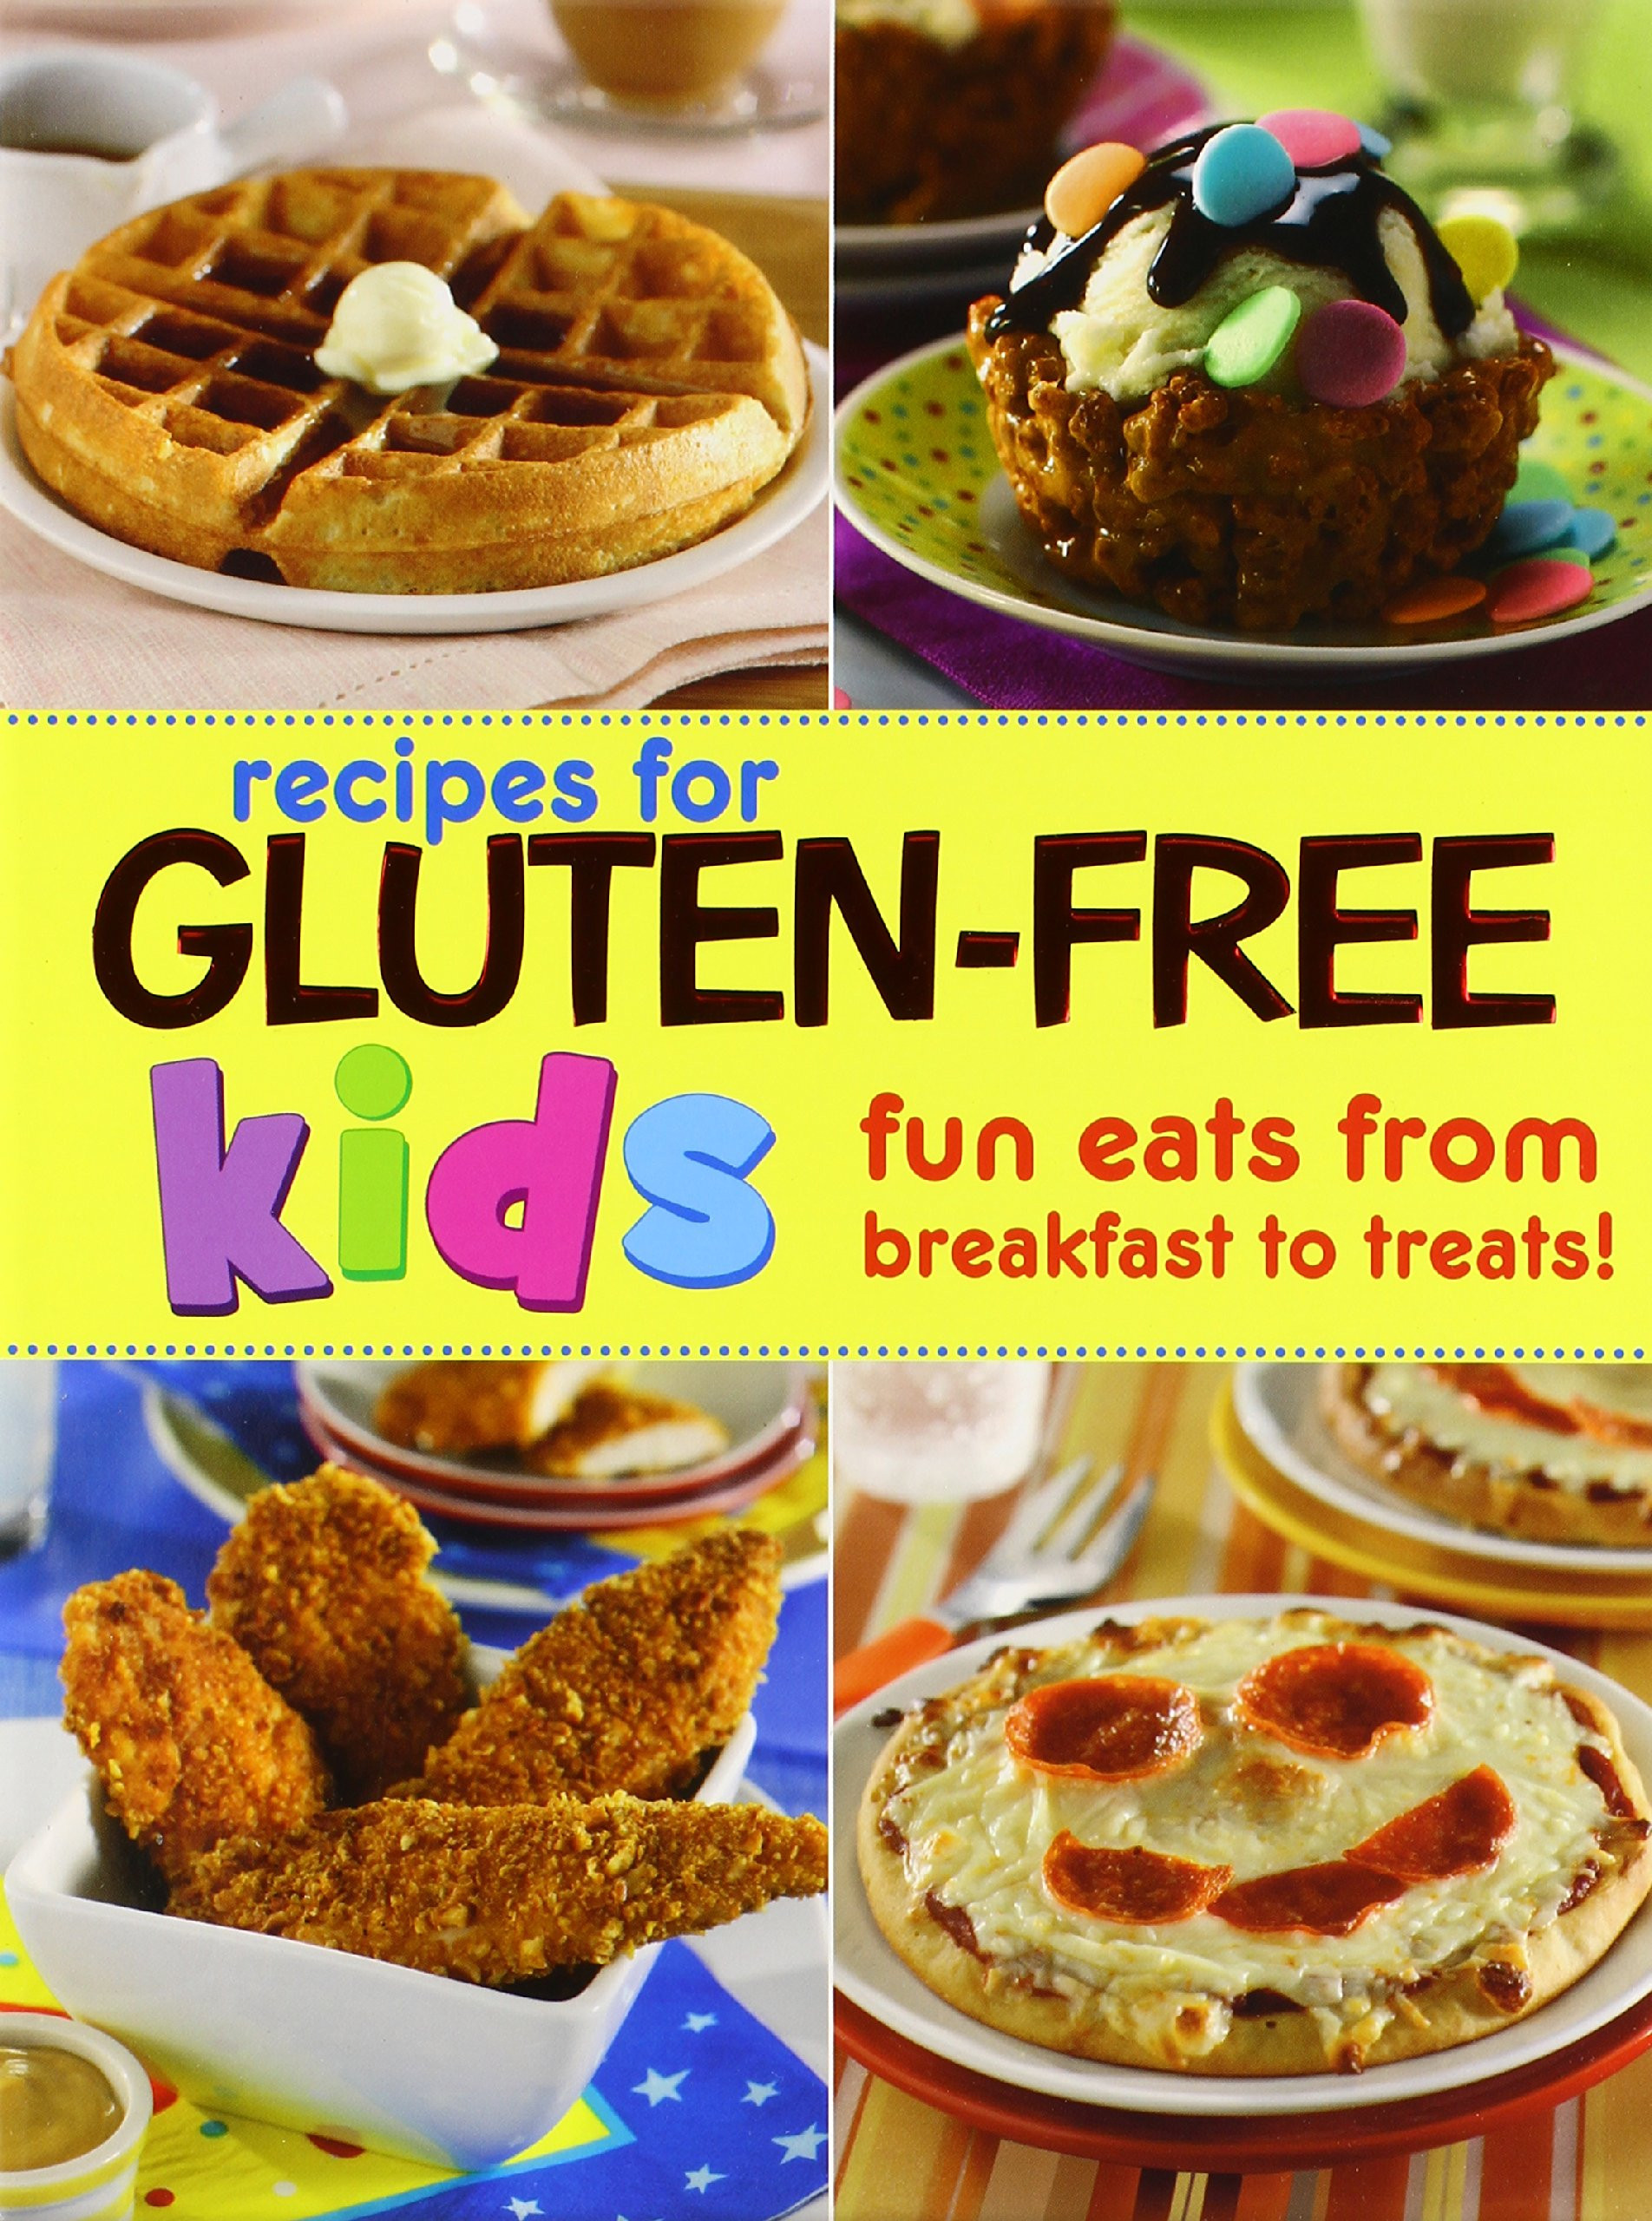 Free Breakfast For Kids  Gluten Free Casein Free Recipes For Kids